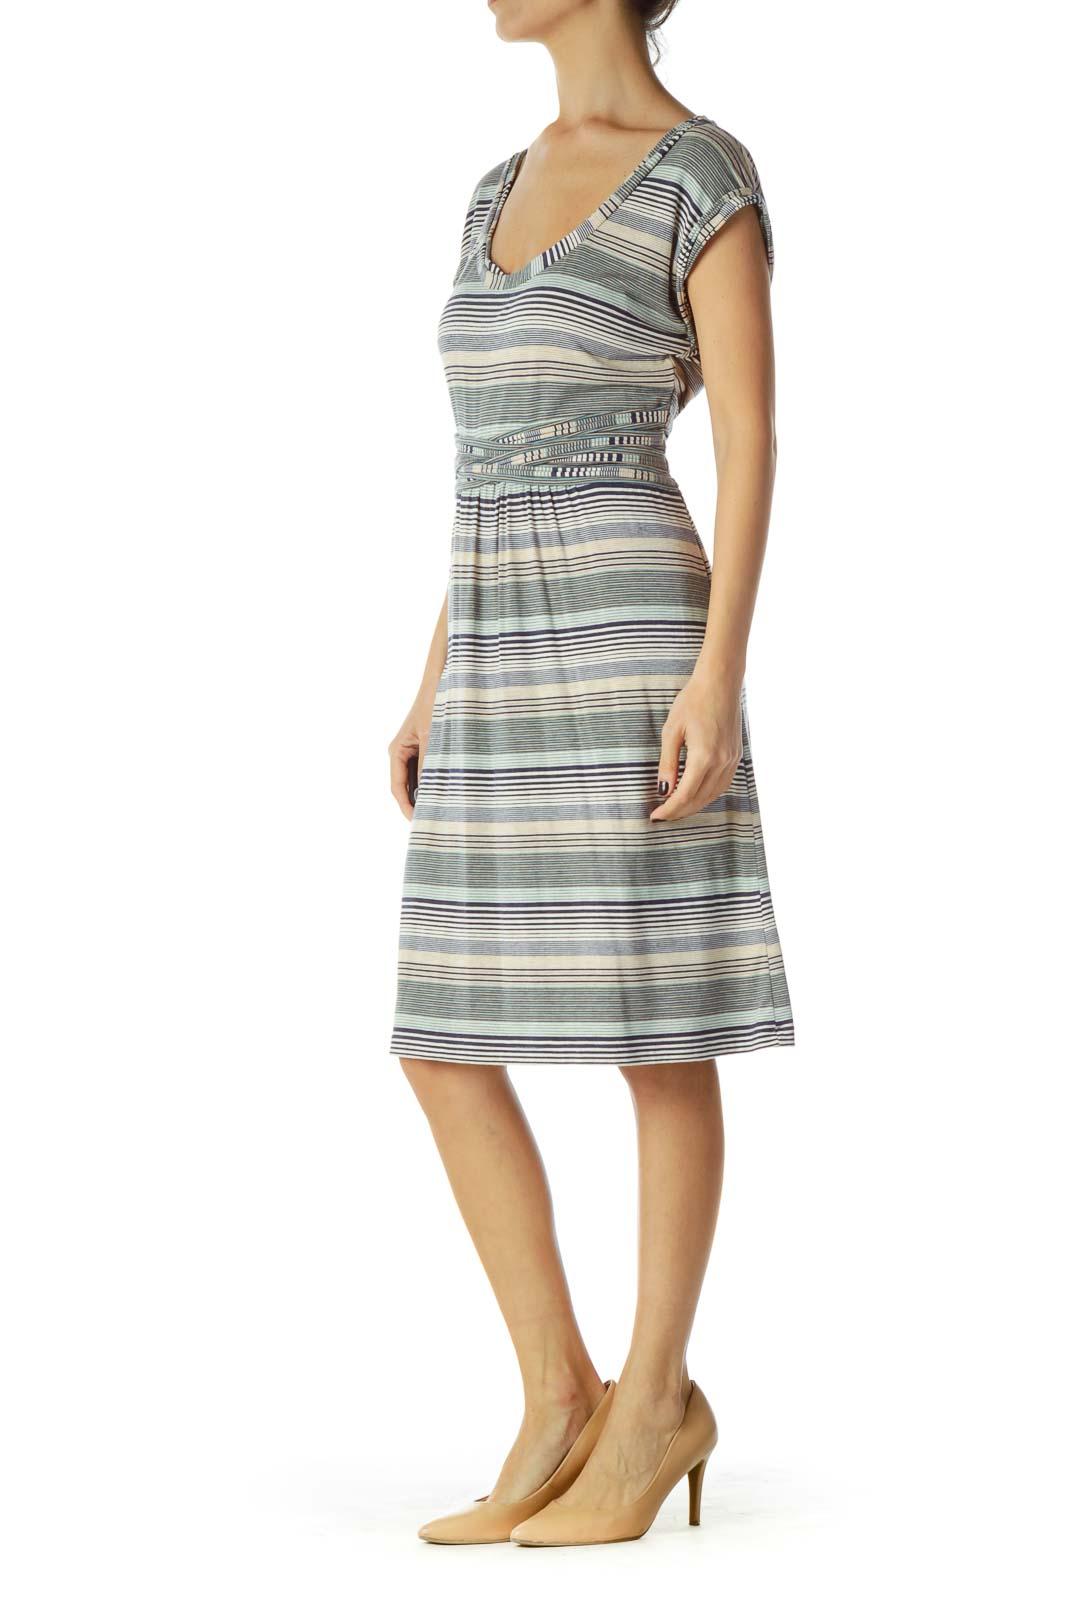 Navy Beige Striped Belted Day Dress